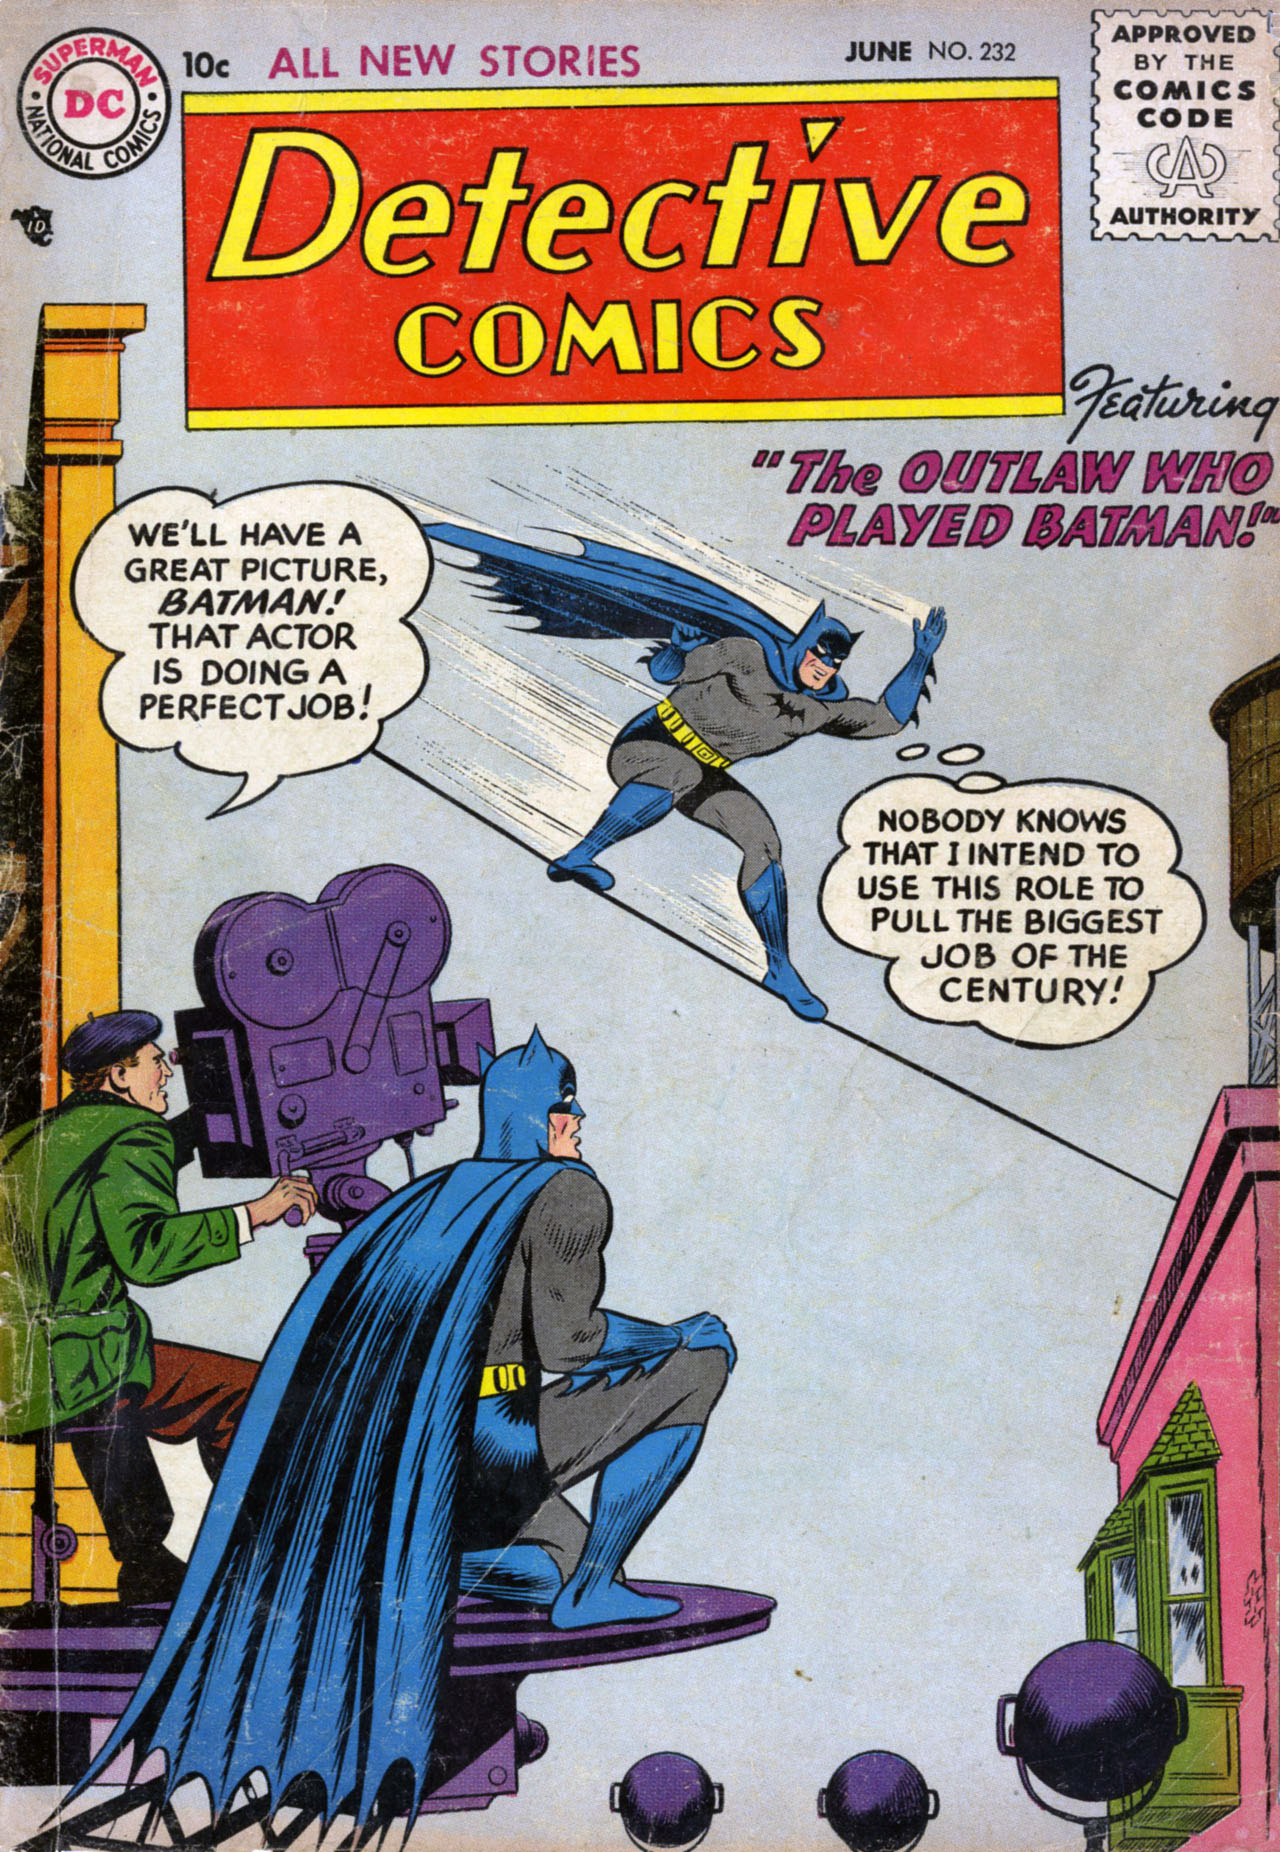 Detective Comics (1937) 232 Page 1